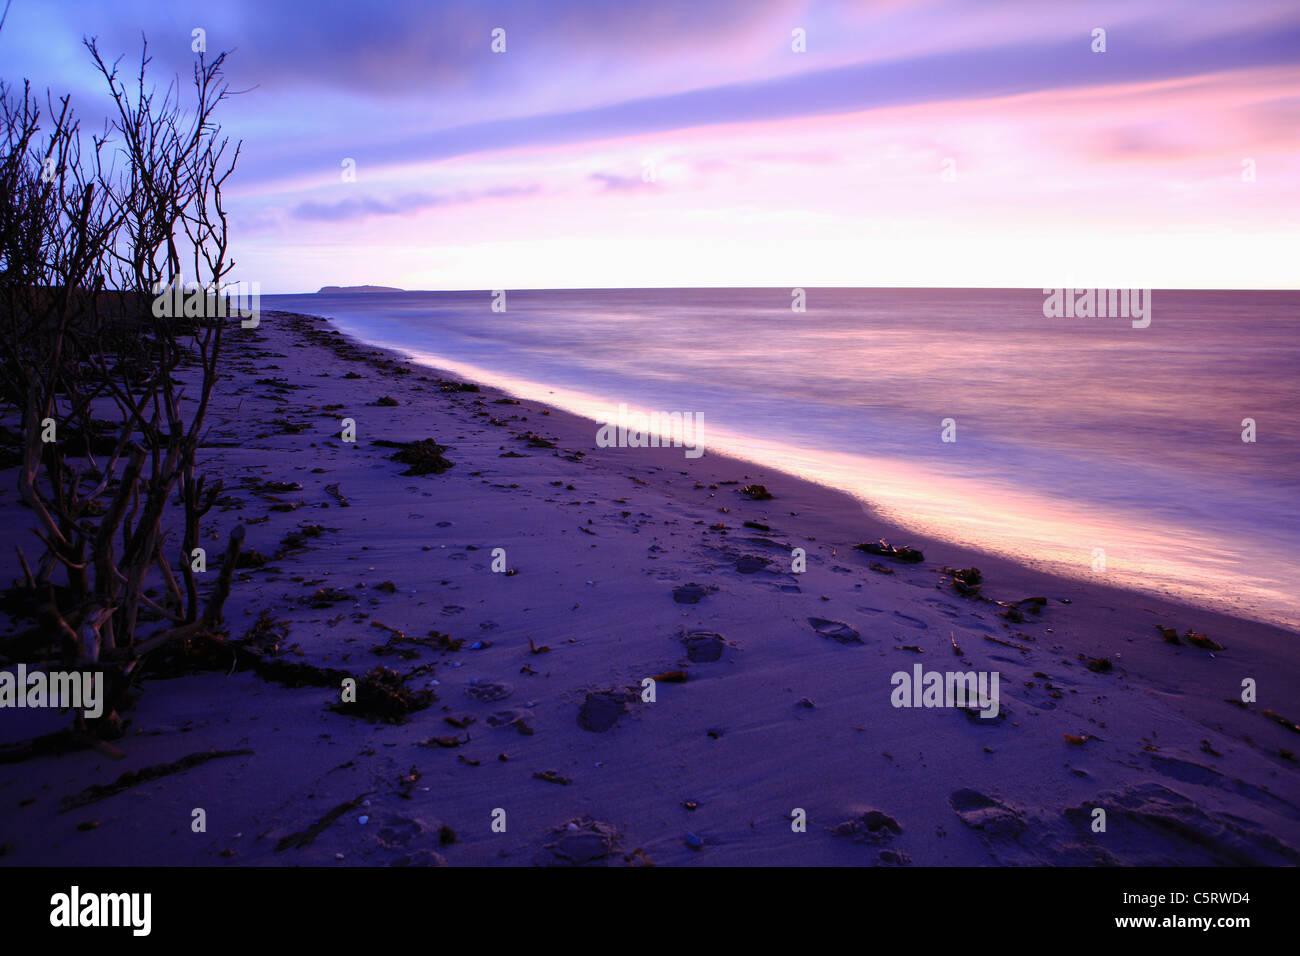 Denmark, Kattegat, Ebeltoft, Baltic Sea, View of beach with beautiful horizon at dusk - Stock Image